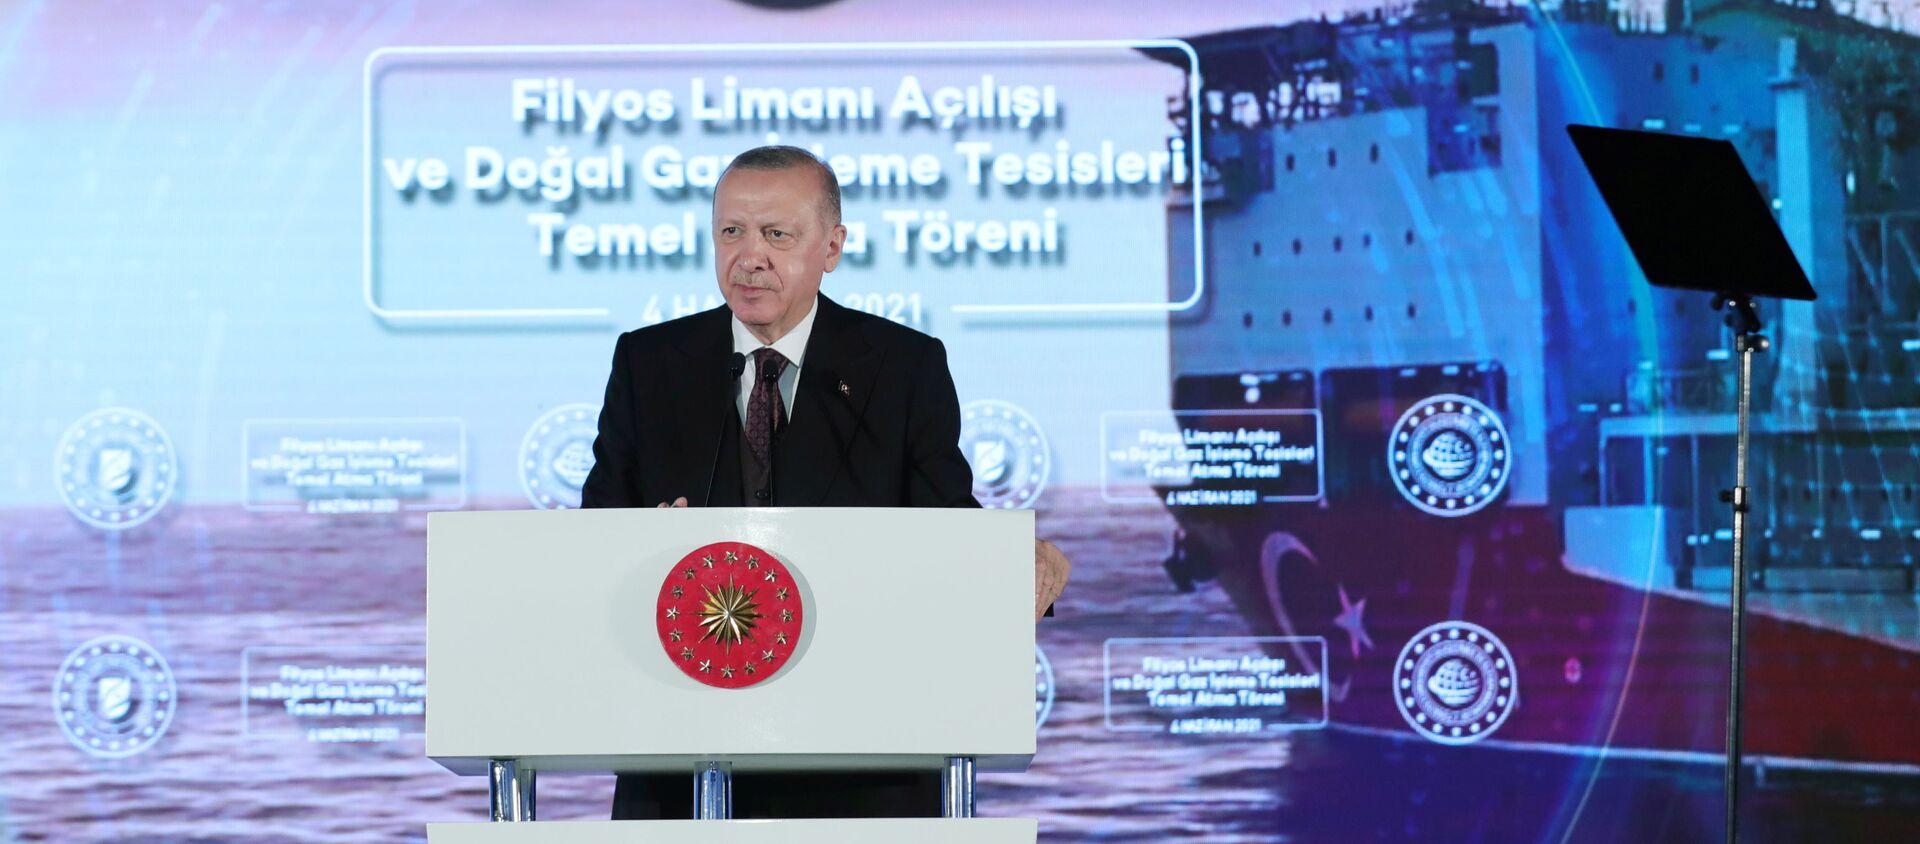 Turkish President Tayyip Erdogan speaks during the opening ceremony of Filyos port in the Black Sea city of Zonguldak, Turkey on 4 June 2021. - Sputnik International, 1920, 20.07.2021